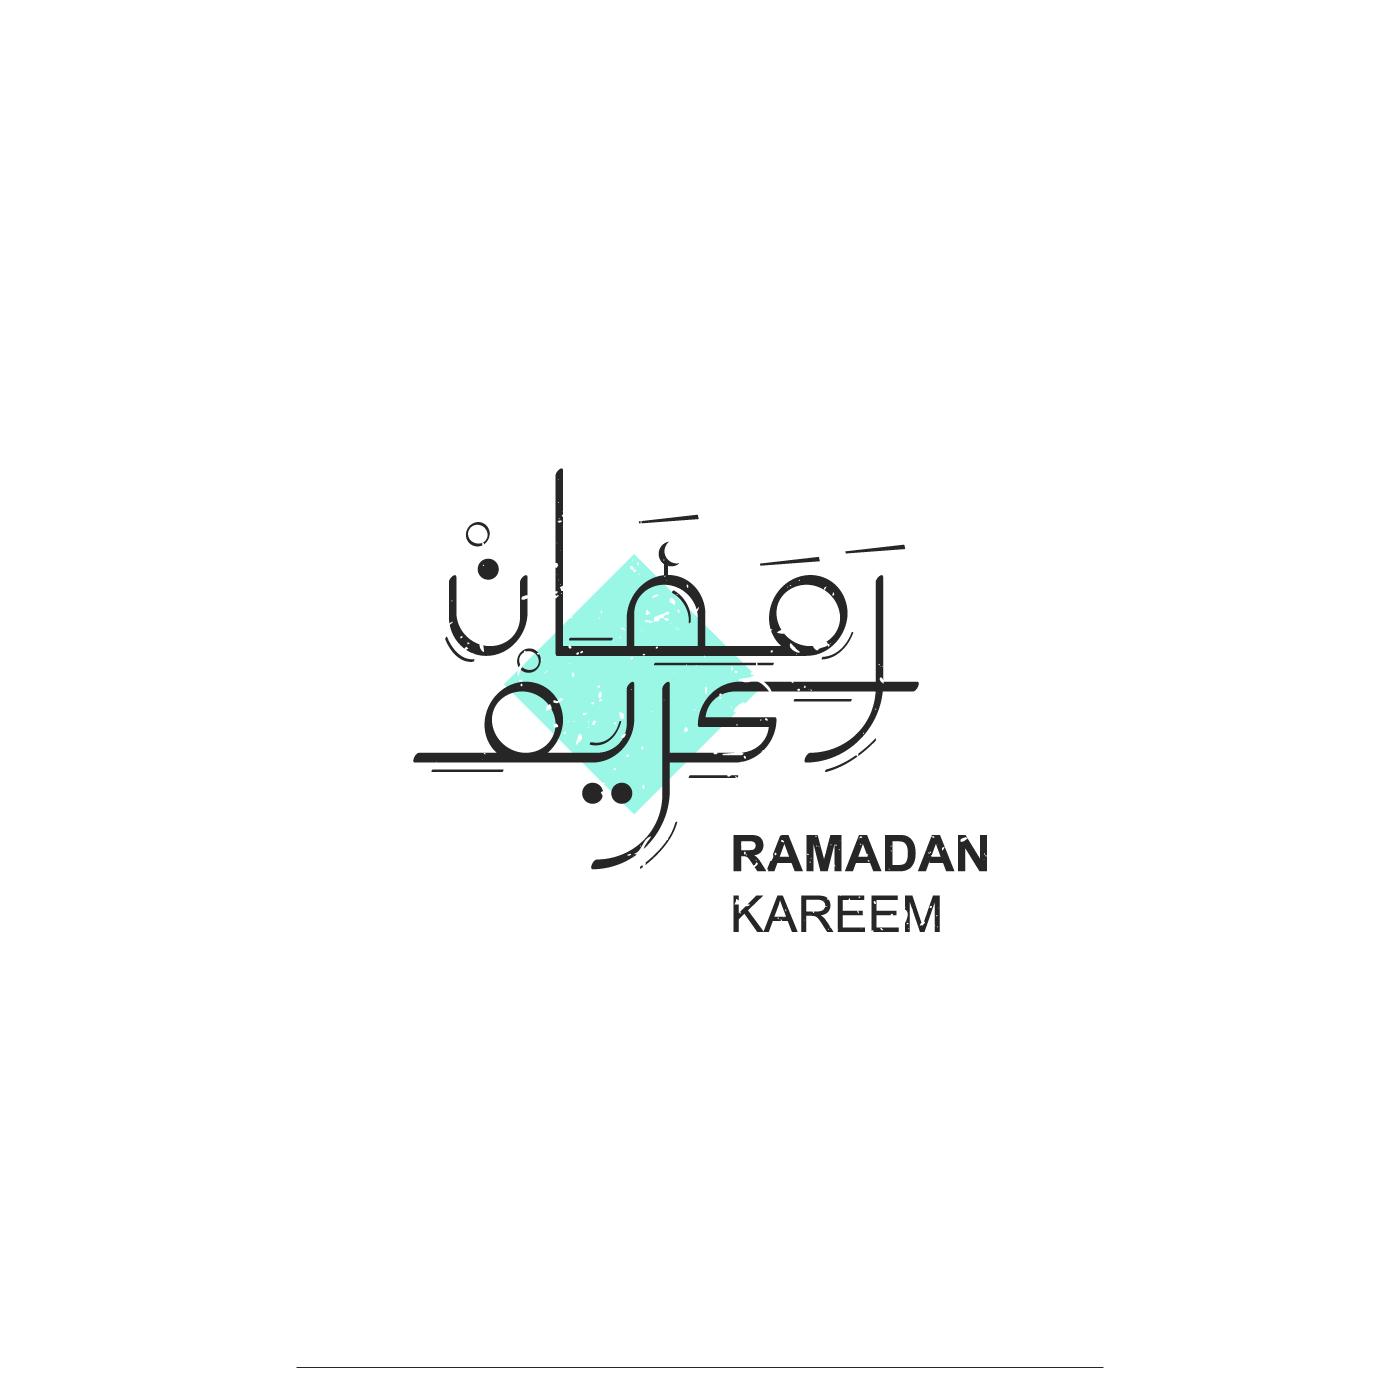 ramadan ramadan kareem Ramadan Mubarak typography   type font رمضان عيد رمضان كريم تايبوغرافي